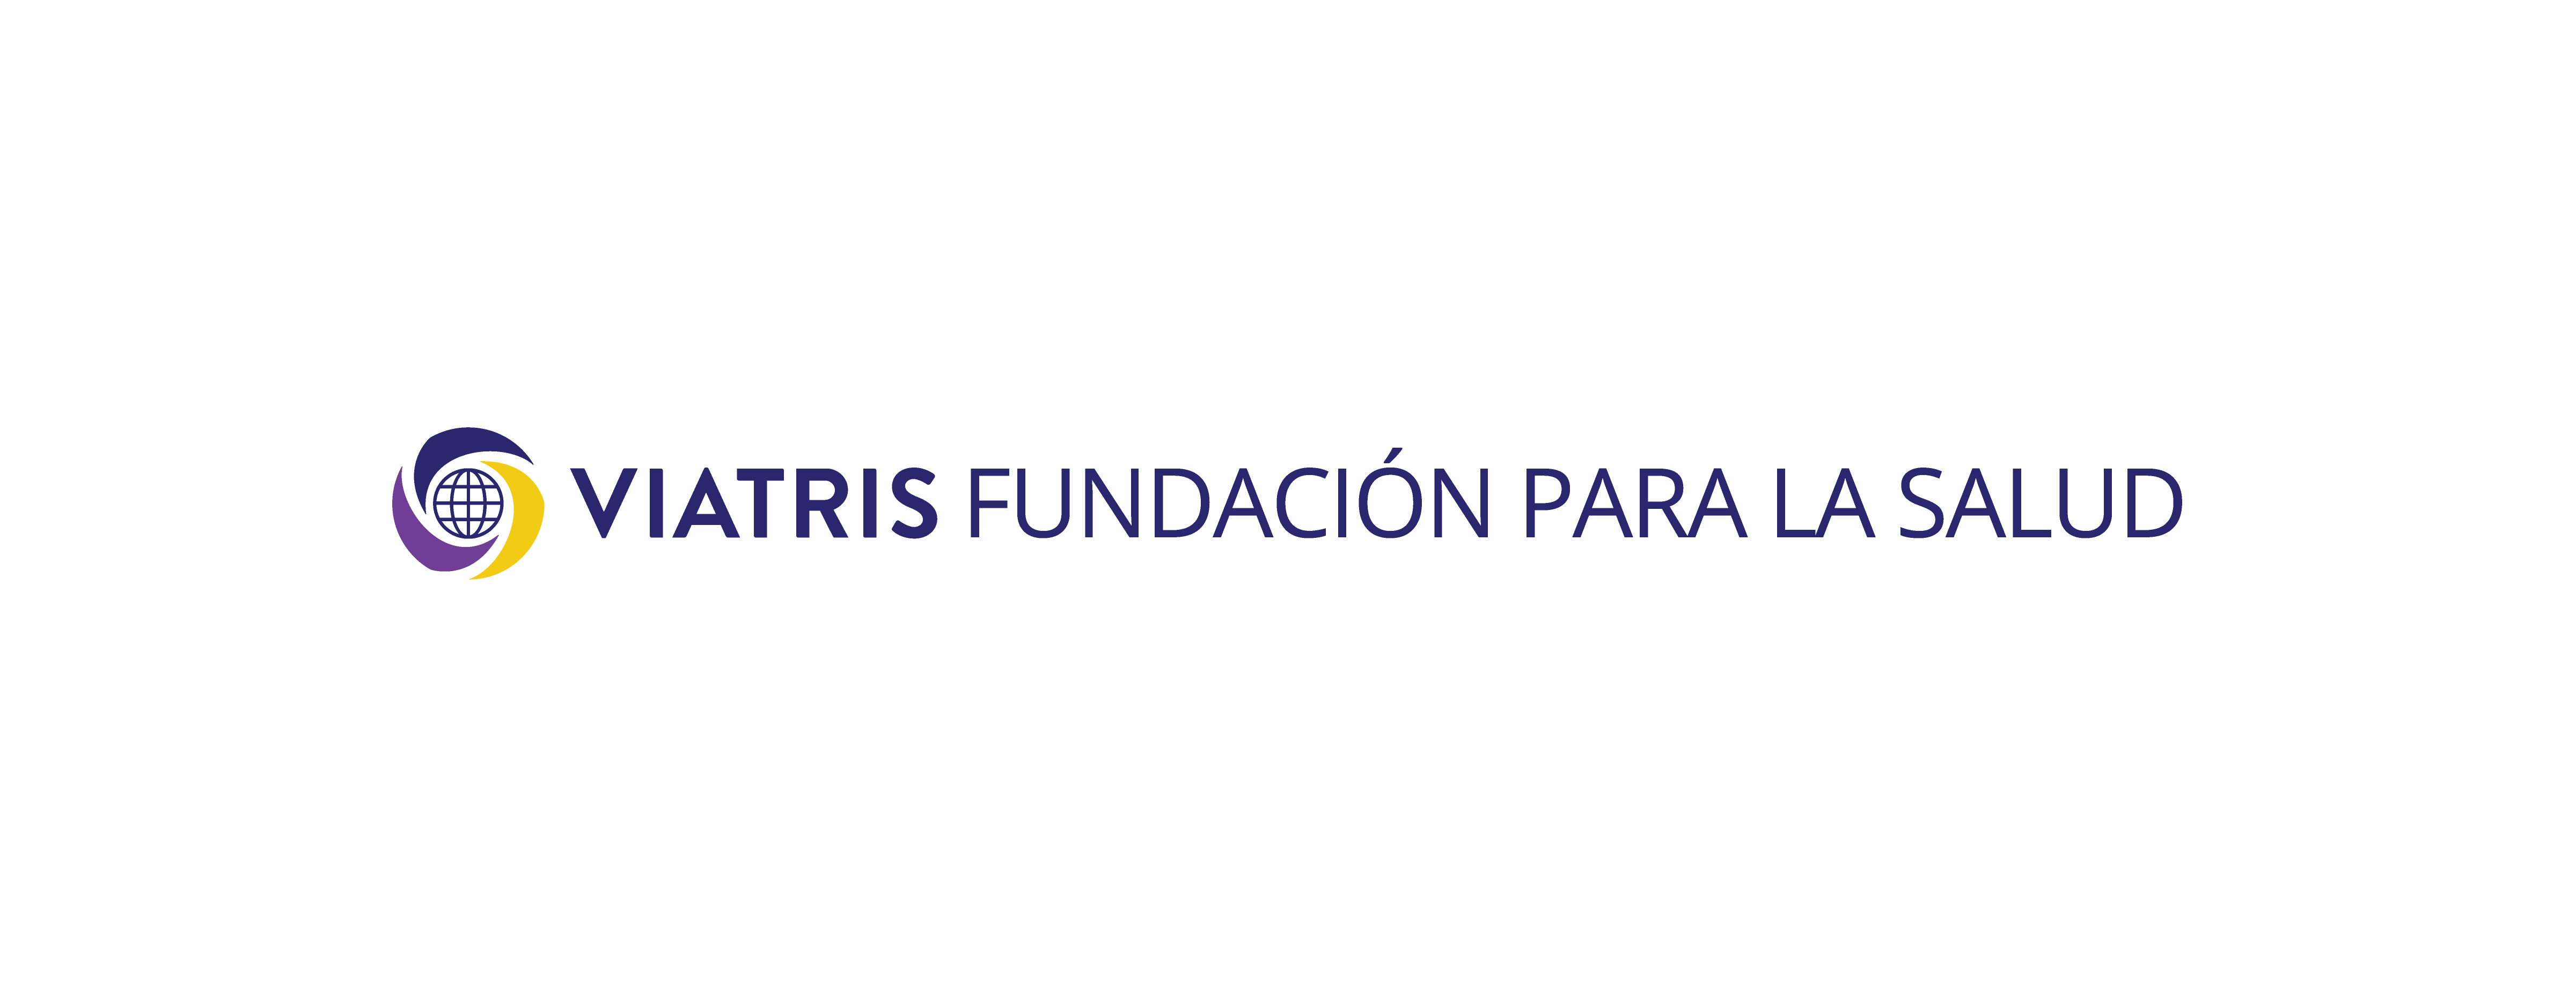 Logo Fundación Viatris.